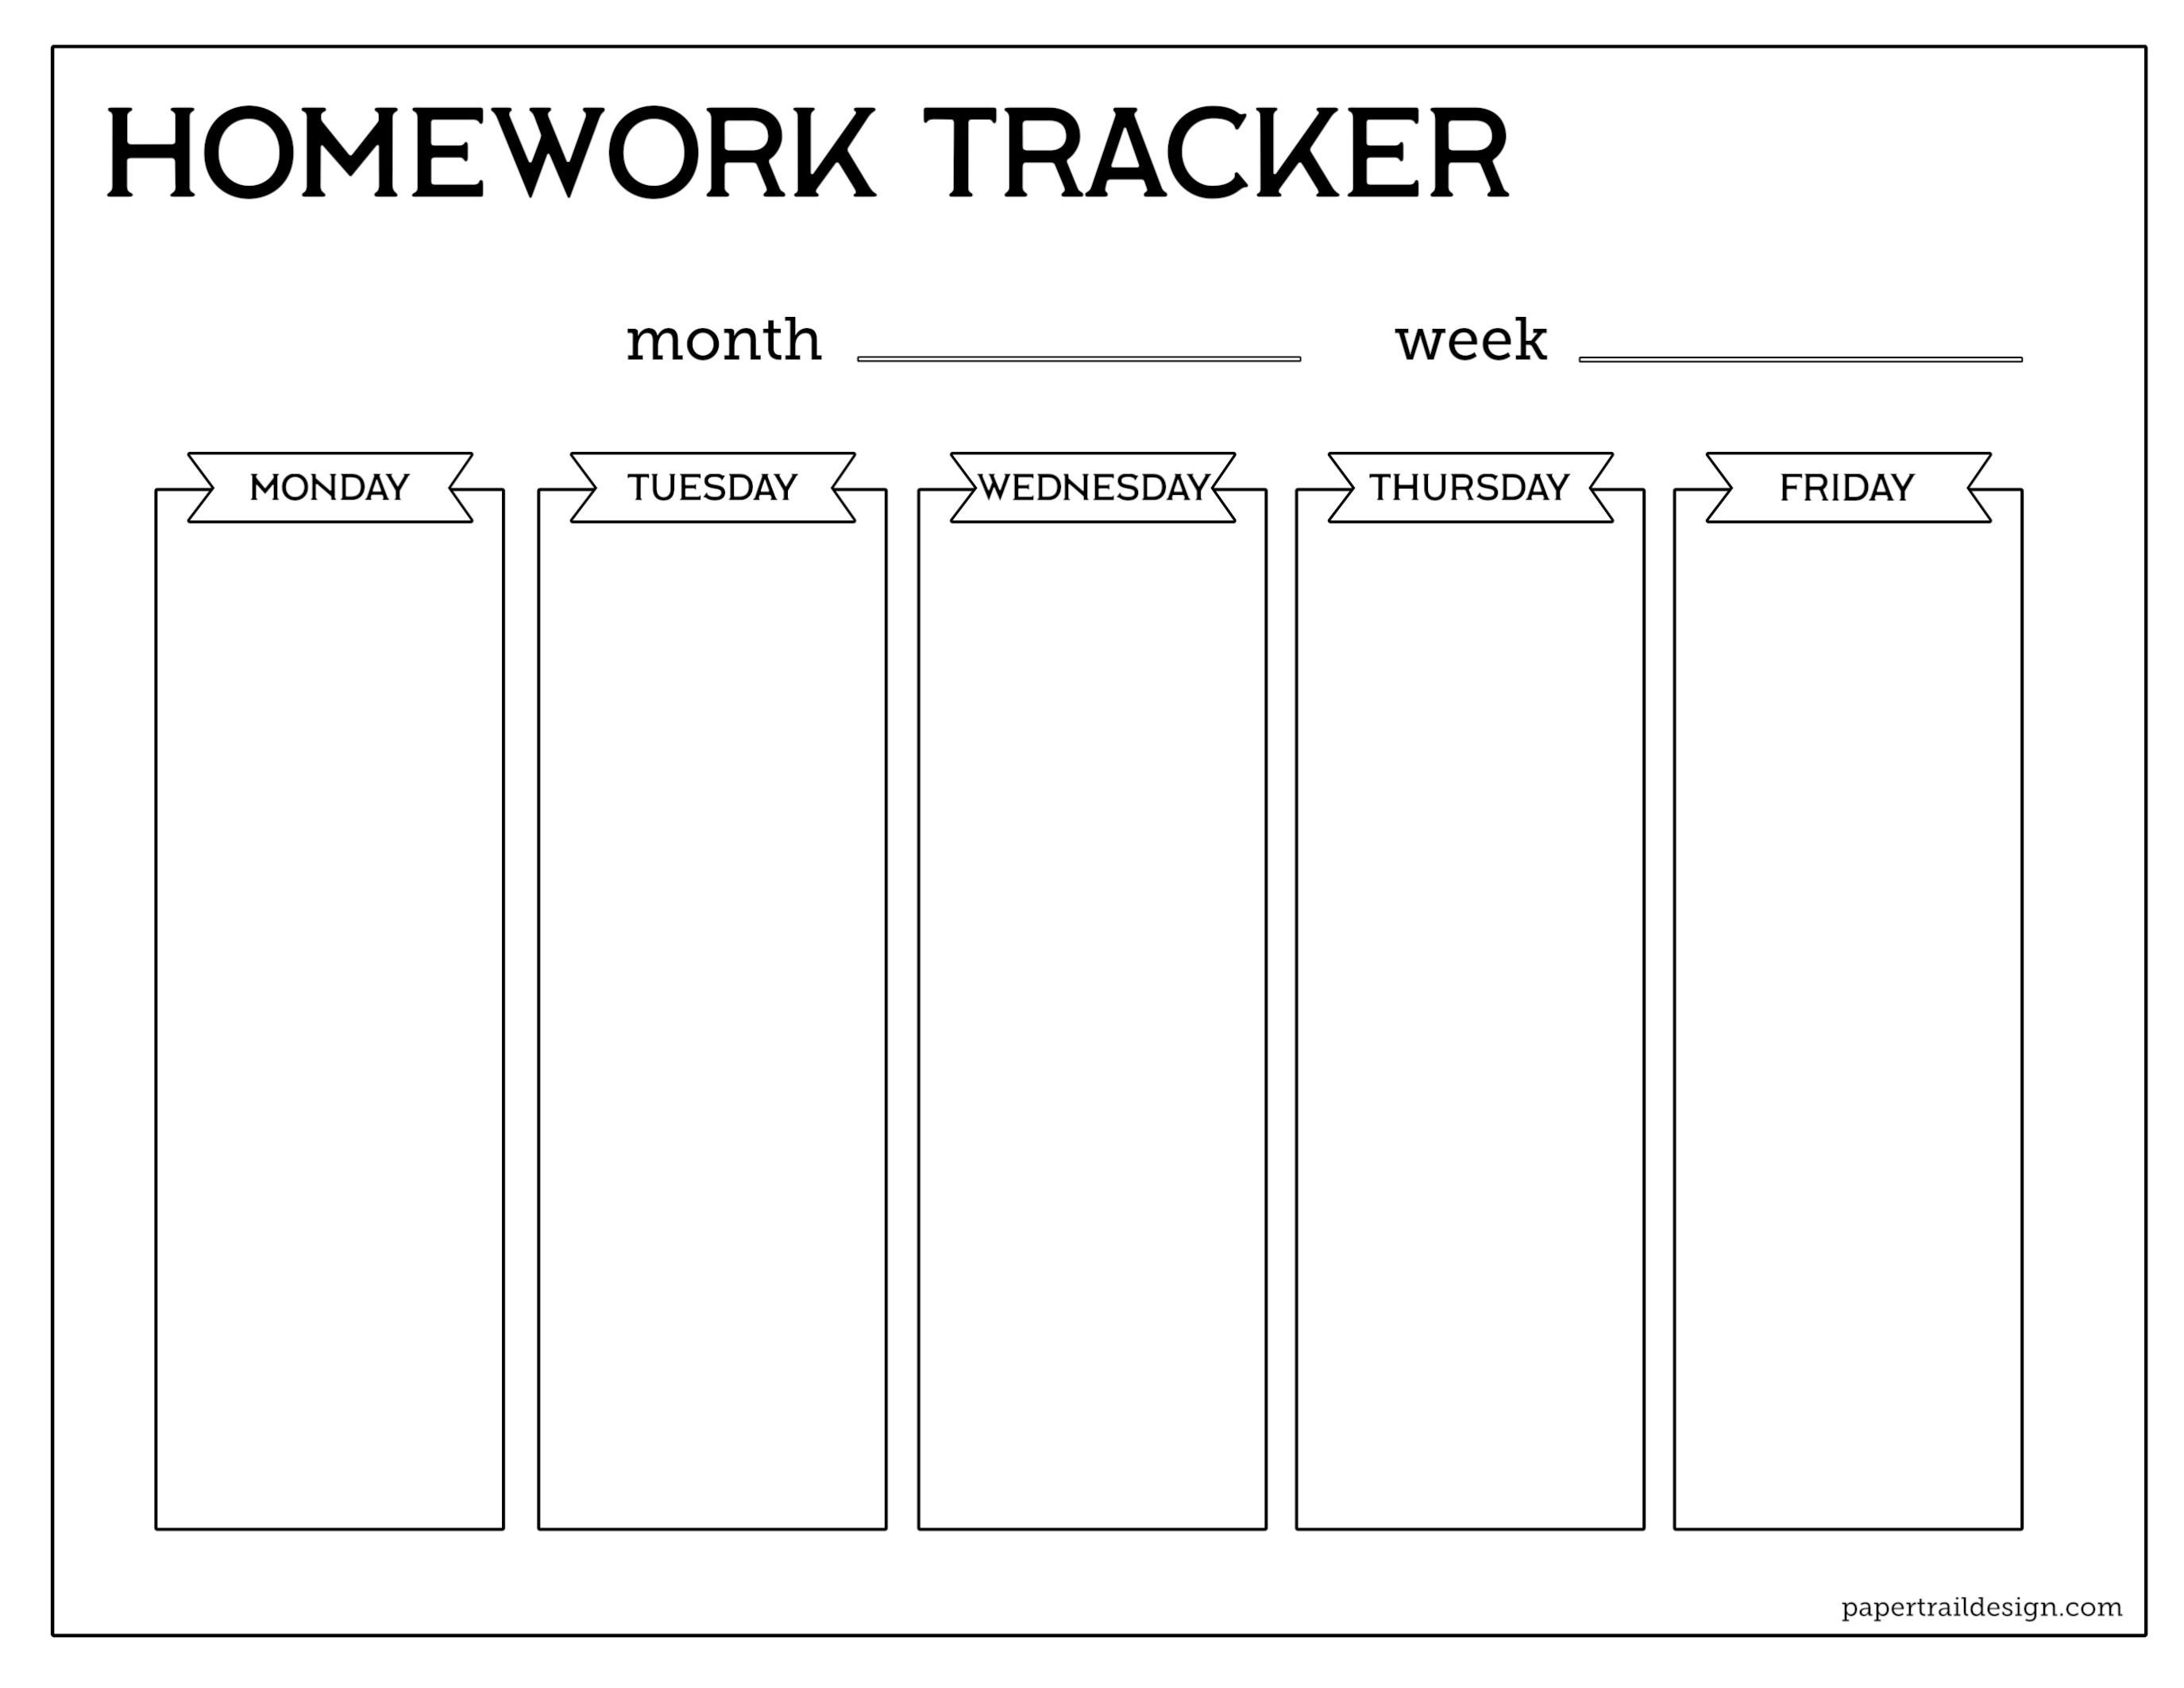 Free Printable Student Homework Planner Template - Paper Trail Design - Free Printable Homework